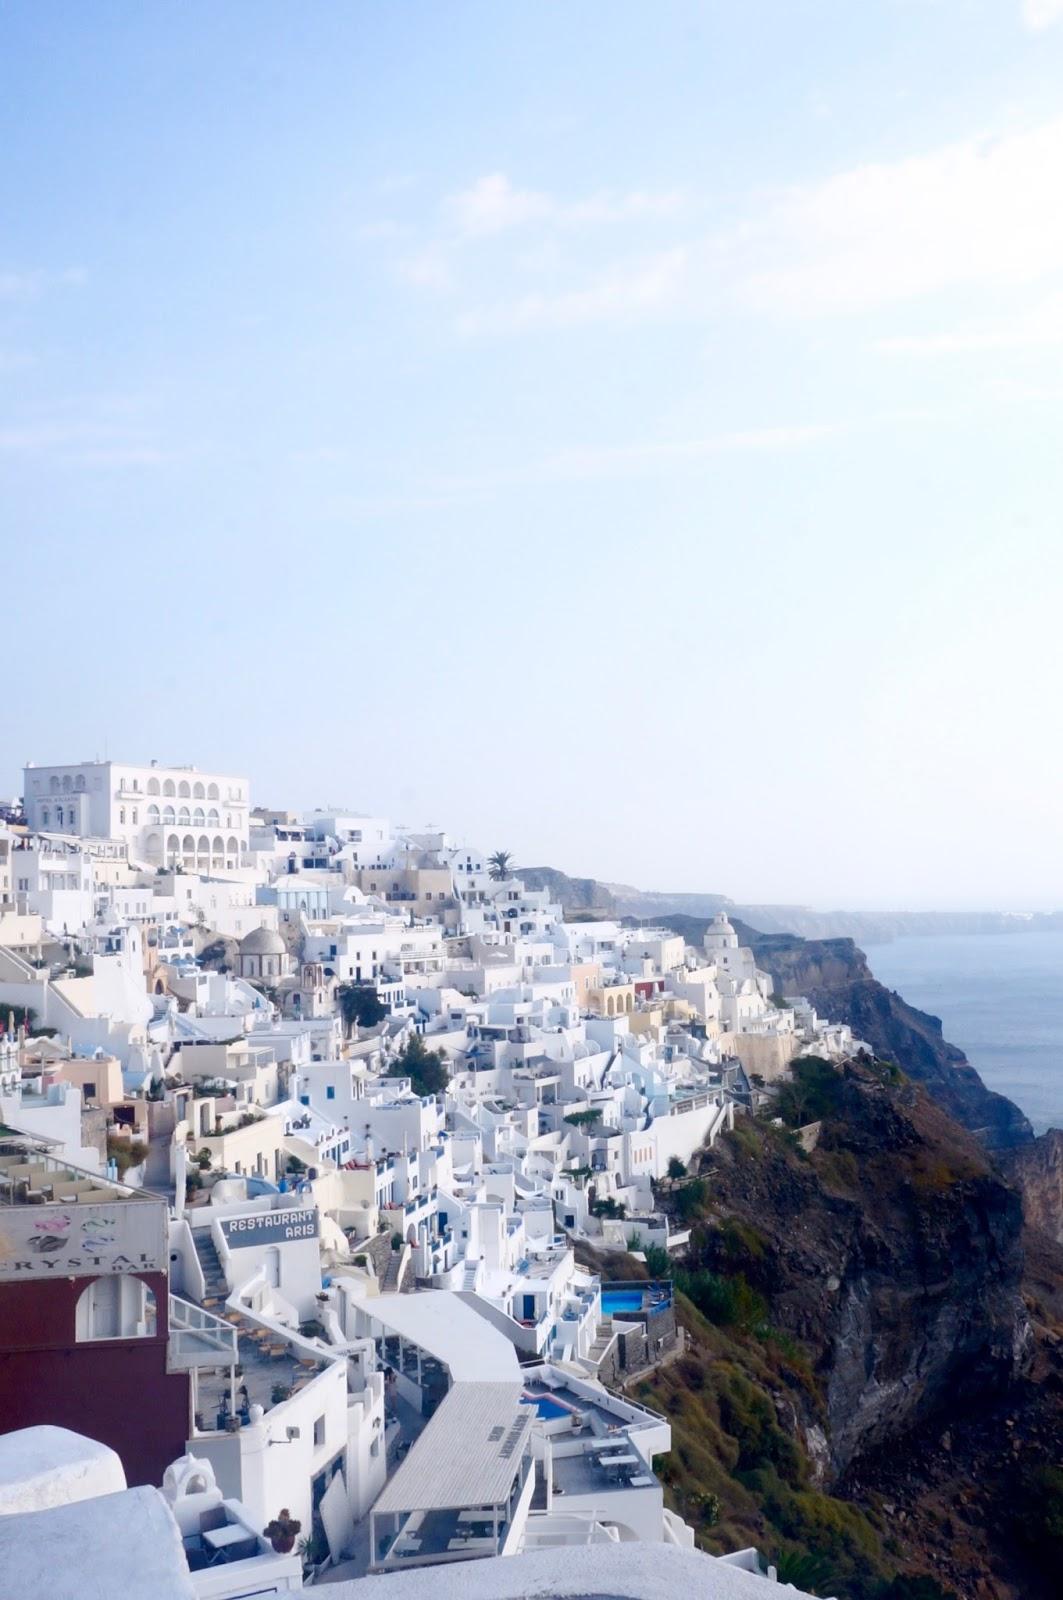 Santorini Travel Guide, santorini photo diary, things to see and do in santorini greece, greek island